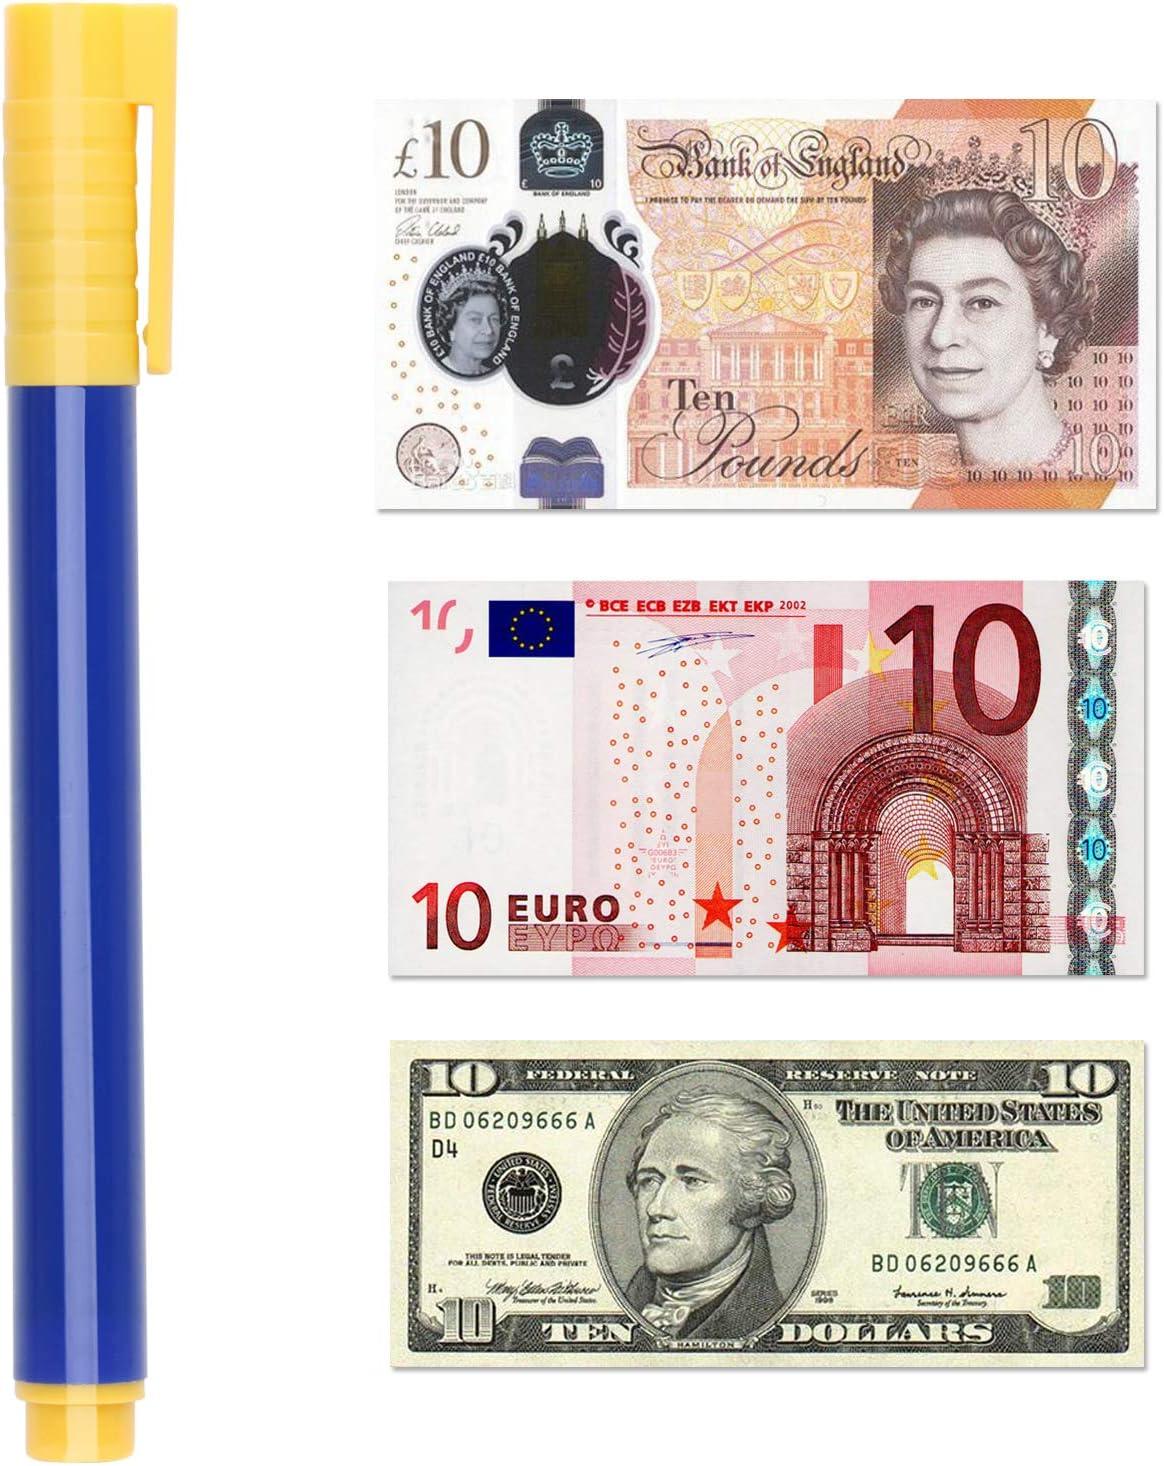 Schneider Fake Currency Notes Detector Counterfit Money Cash Checker Pen